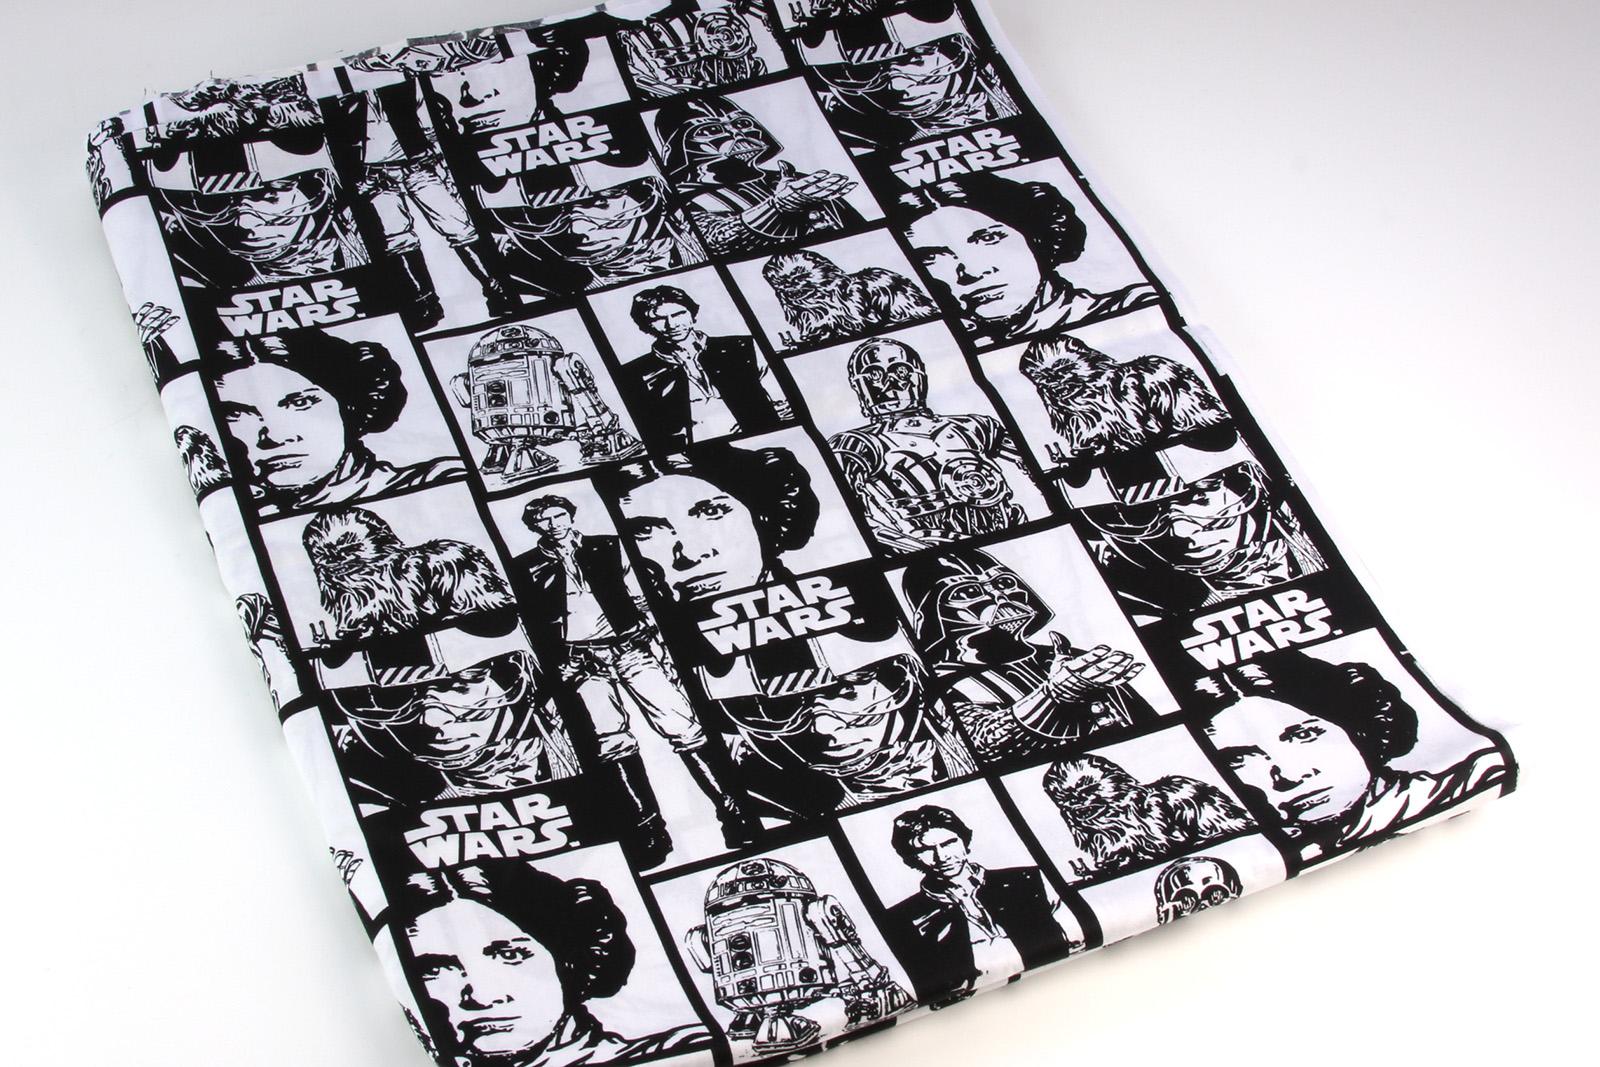 Star wars fabrics the kessel runway for Star wars fabric